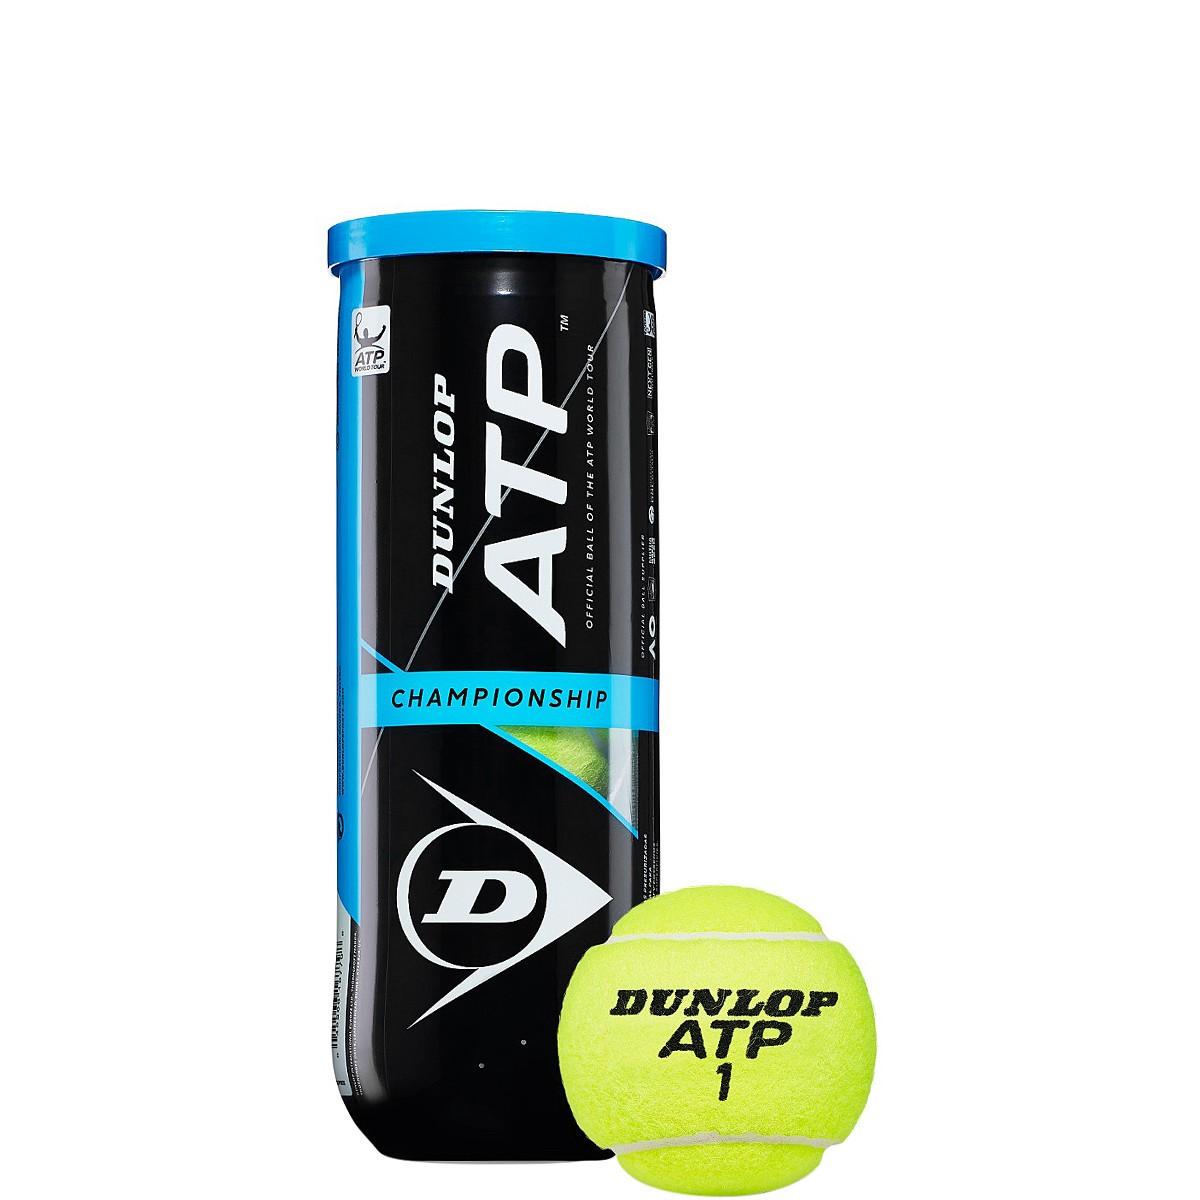 TUBO DE 3 PELOTAS DUNLOP ATP CHAMPIONSHIP